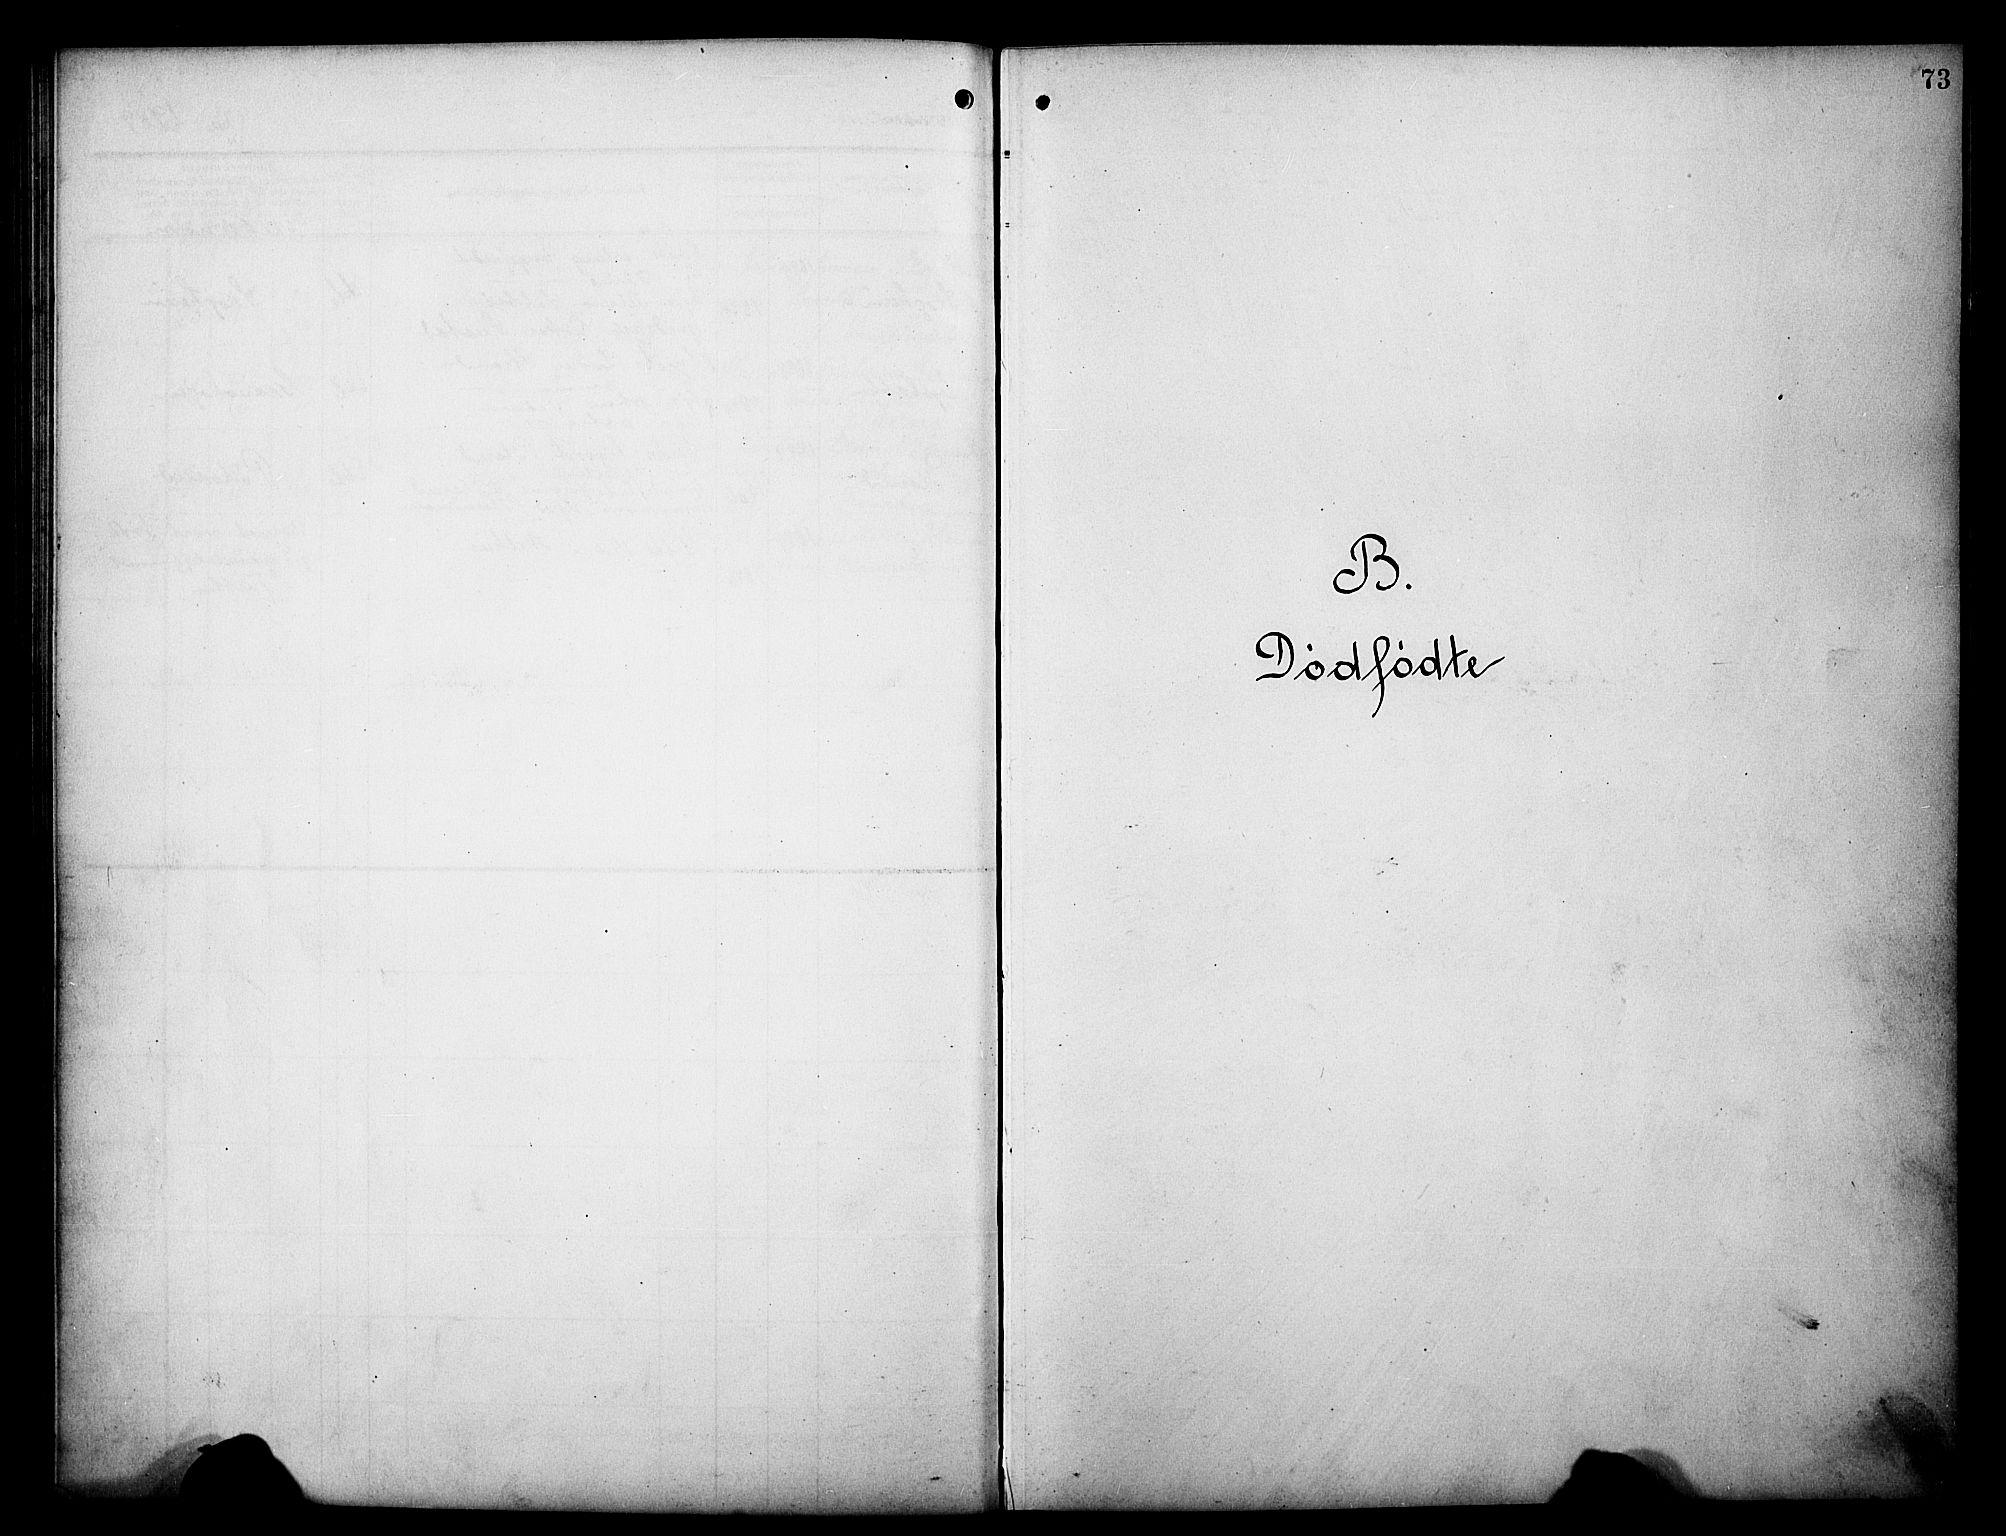 SAH, Øyer prestekontor, Klokkerbok nr. 6, 1906-1929, s. 73